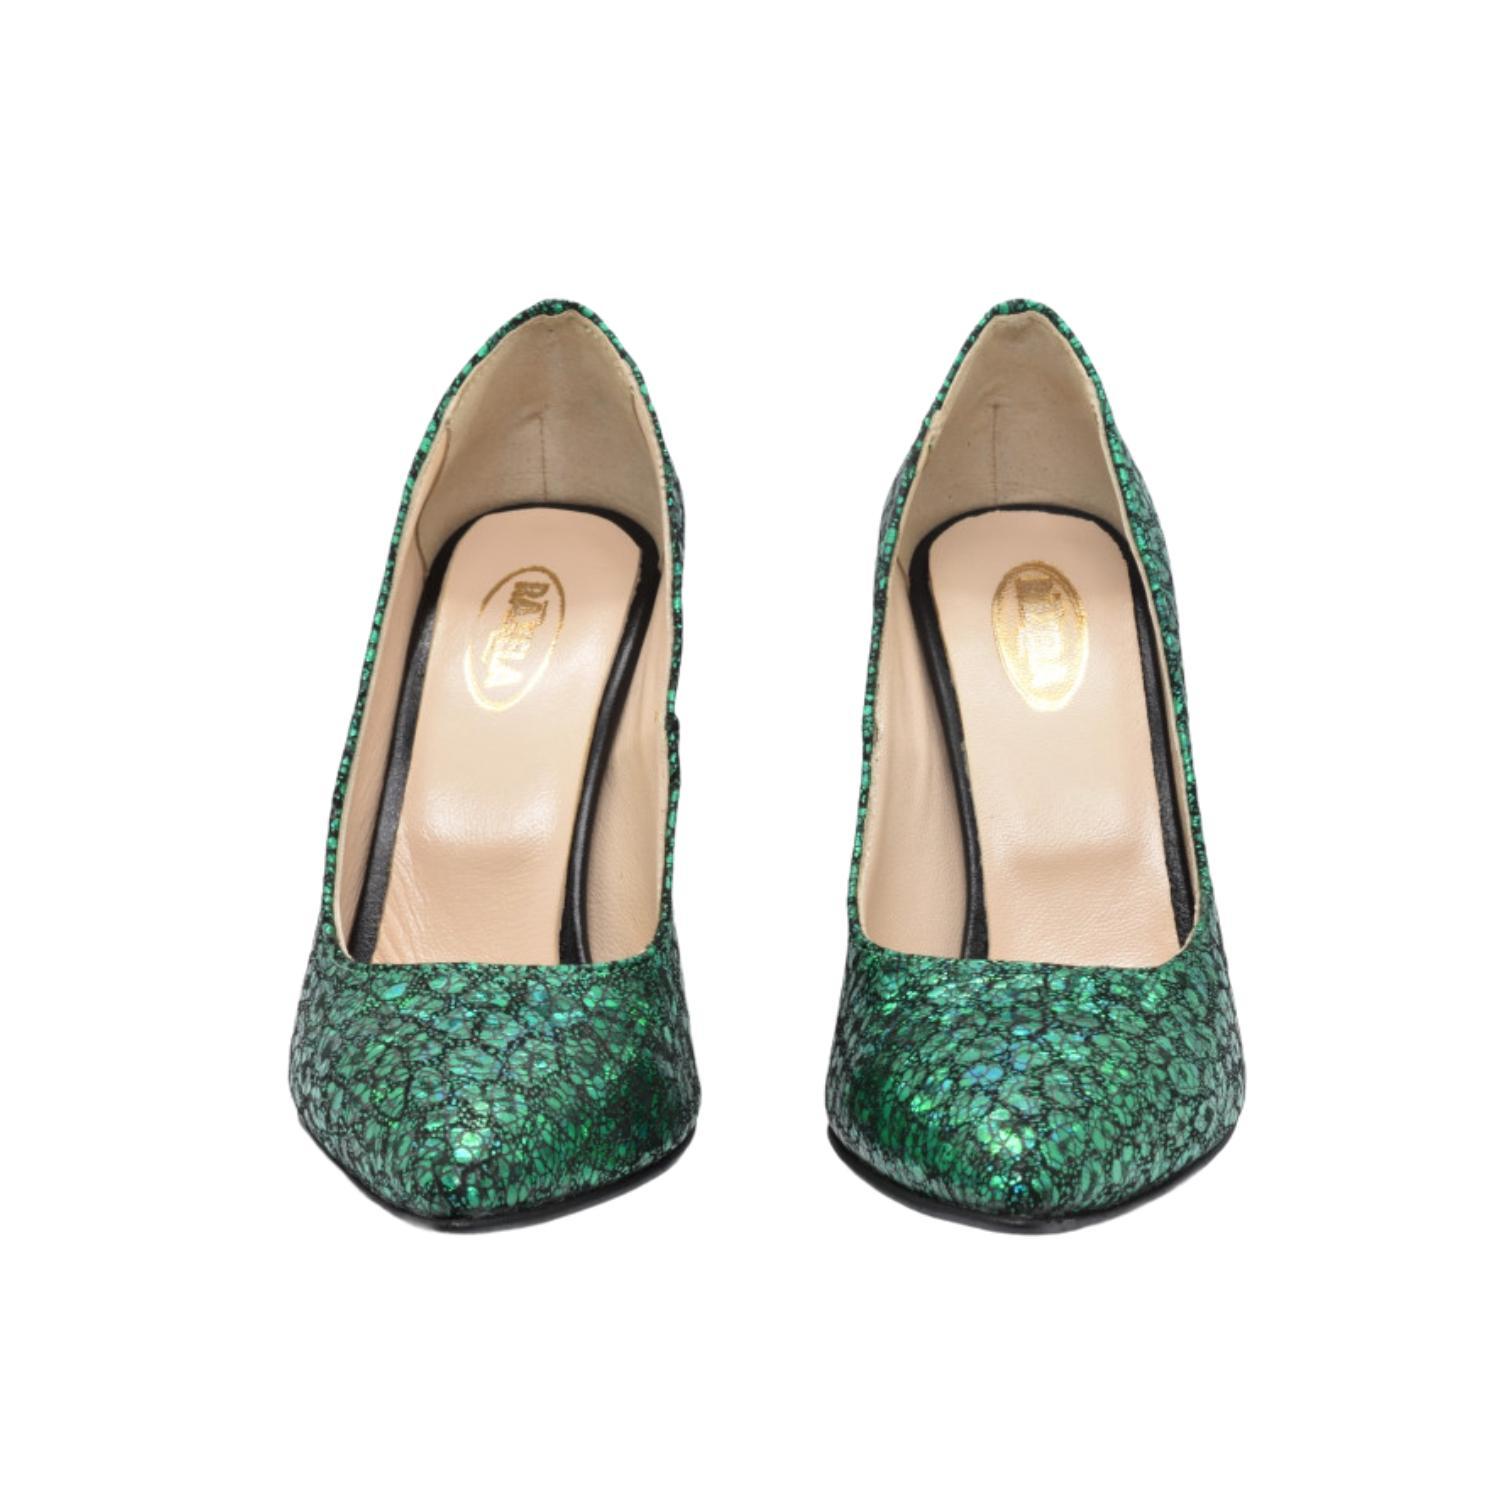 Pantofi verzi cu imprimeu